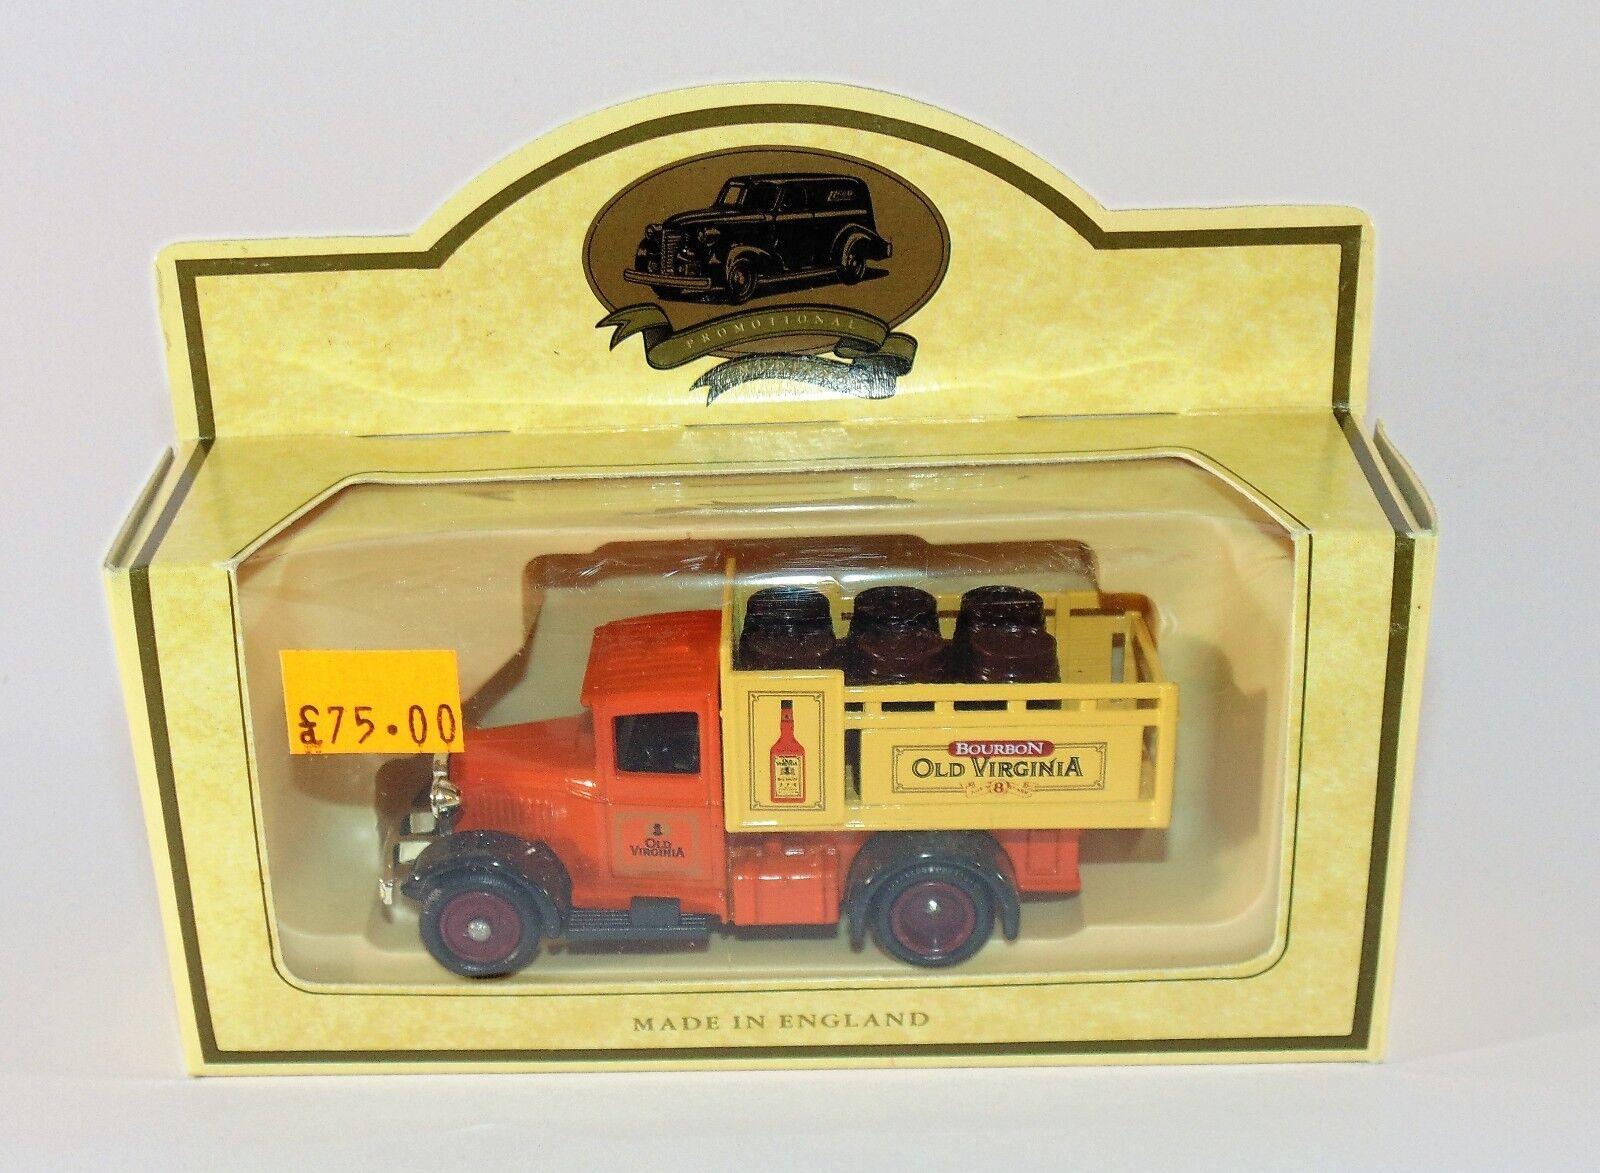 Lledo modelli promozionale RARO CAMION BOURBON Old Virginia Van 8